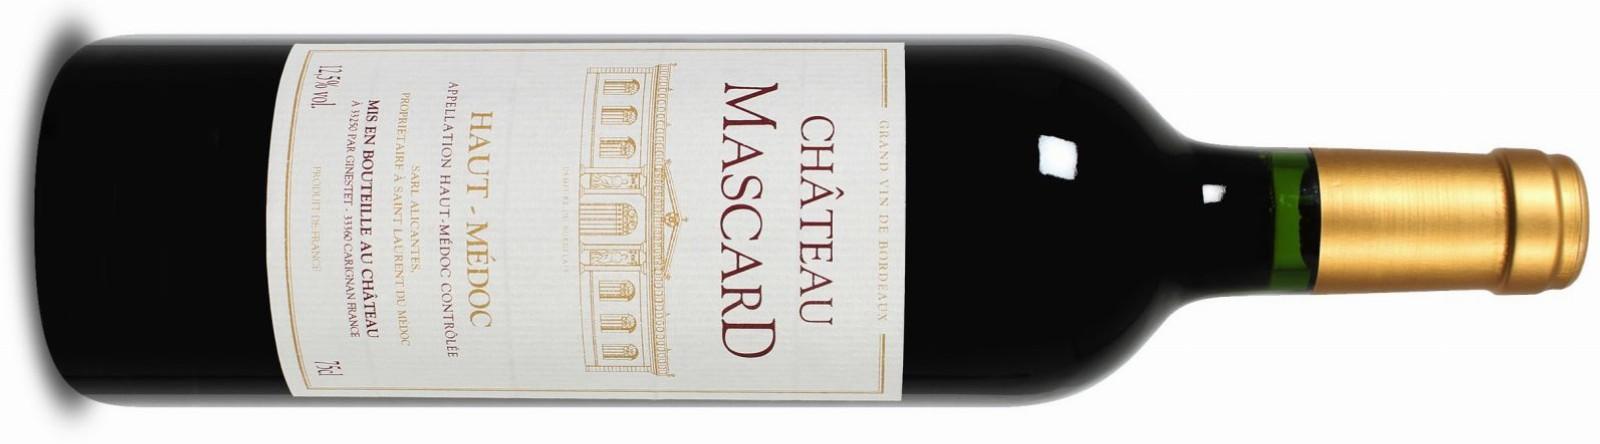 Château Mascard 2010